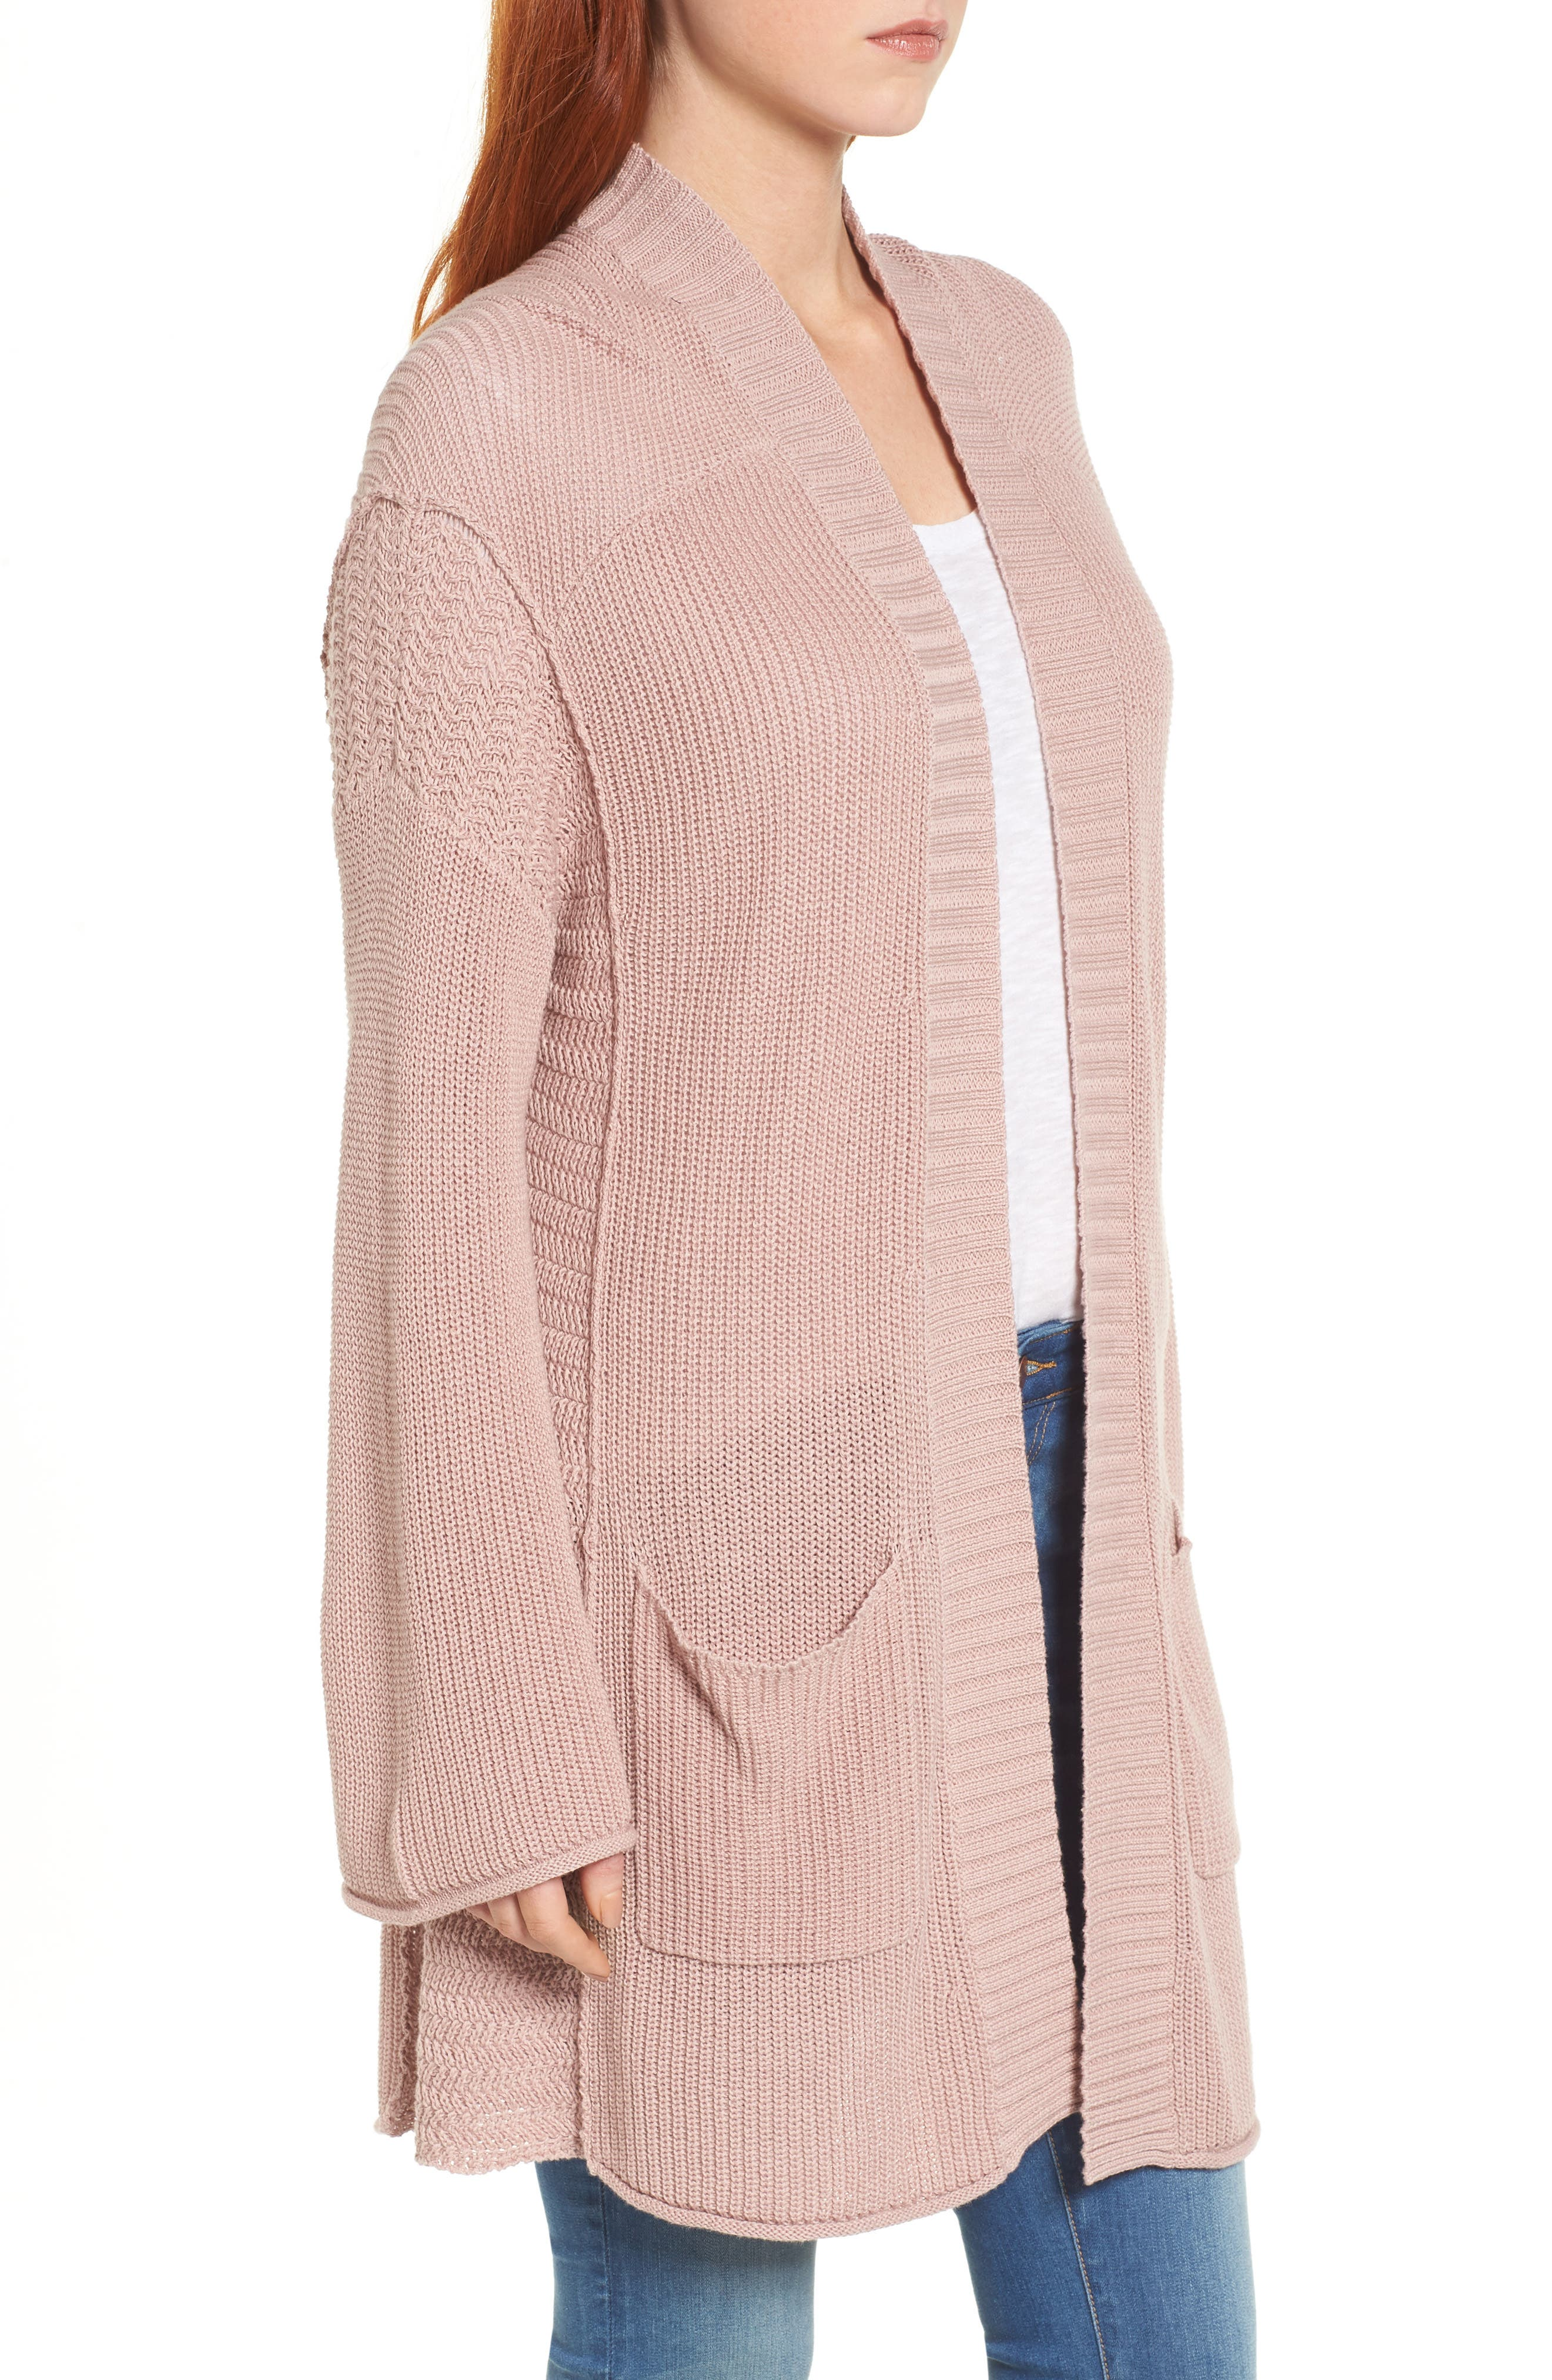 Open Cotton Cardigan,                             Alternate thumbnail 3, color,                             Pink Adobe